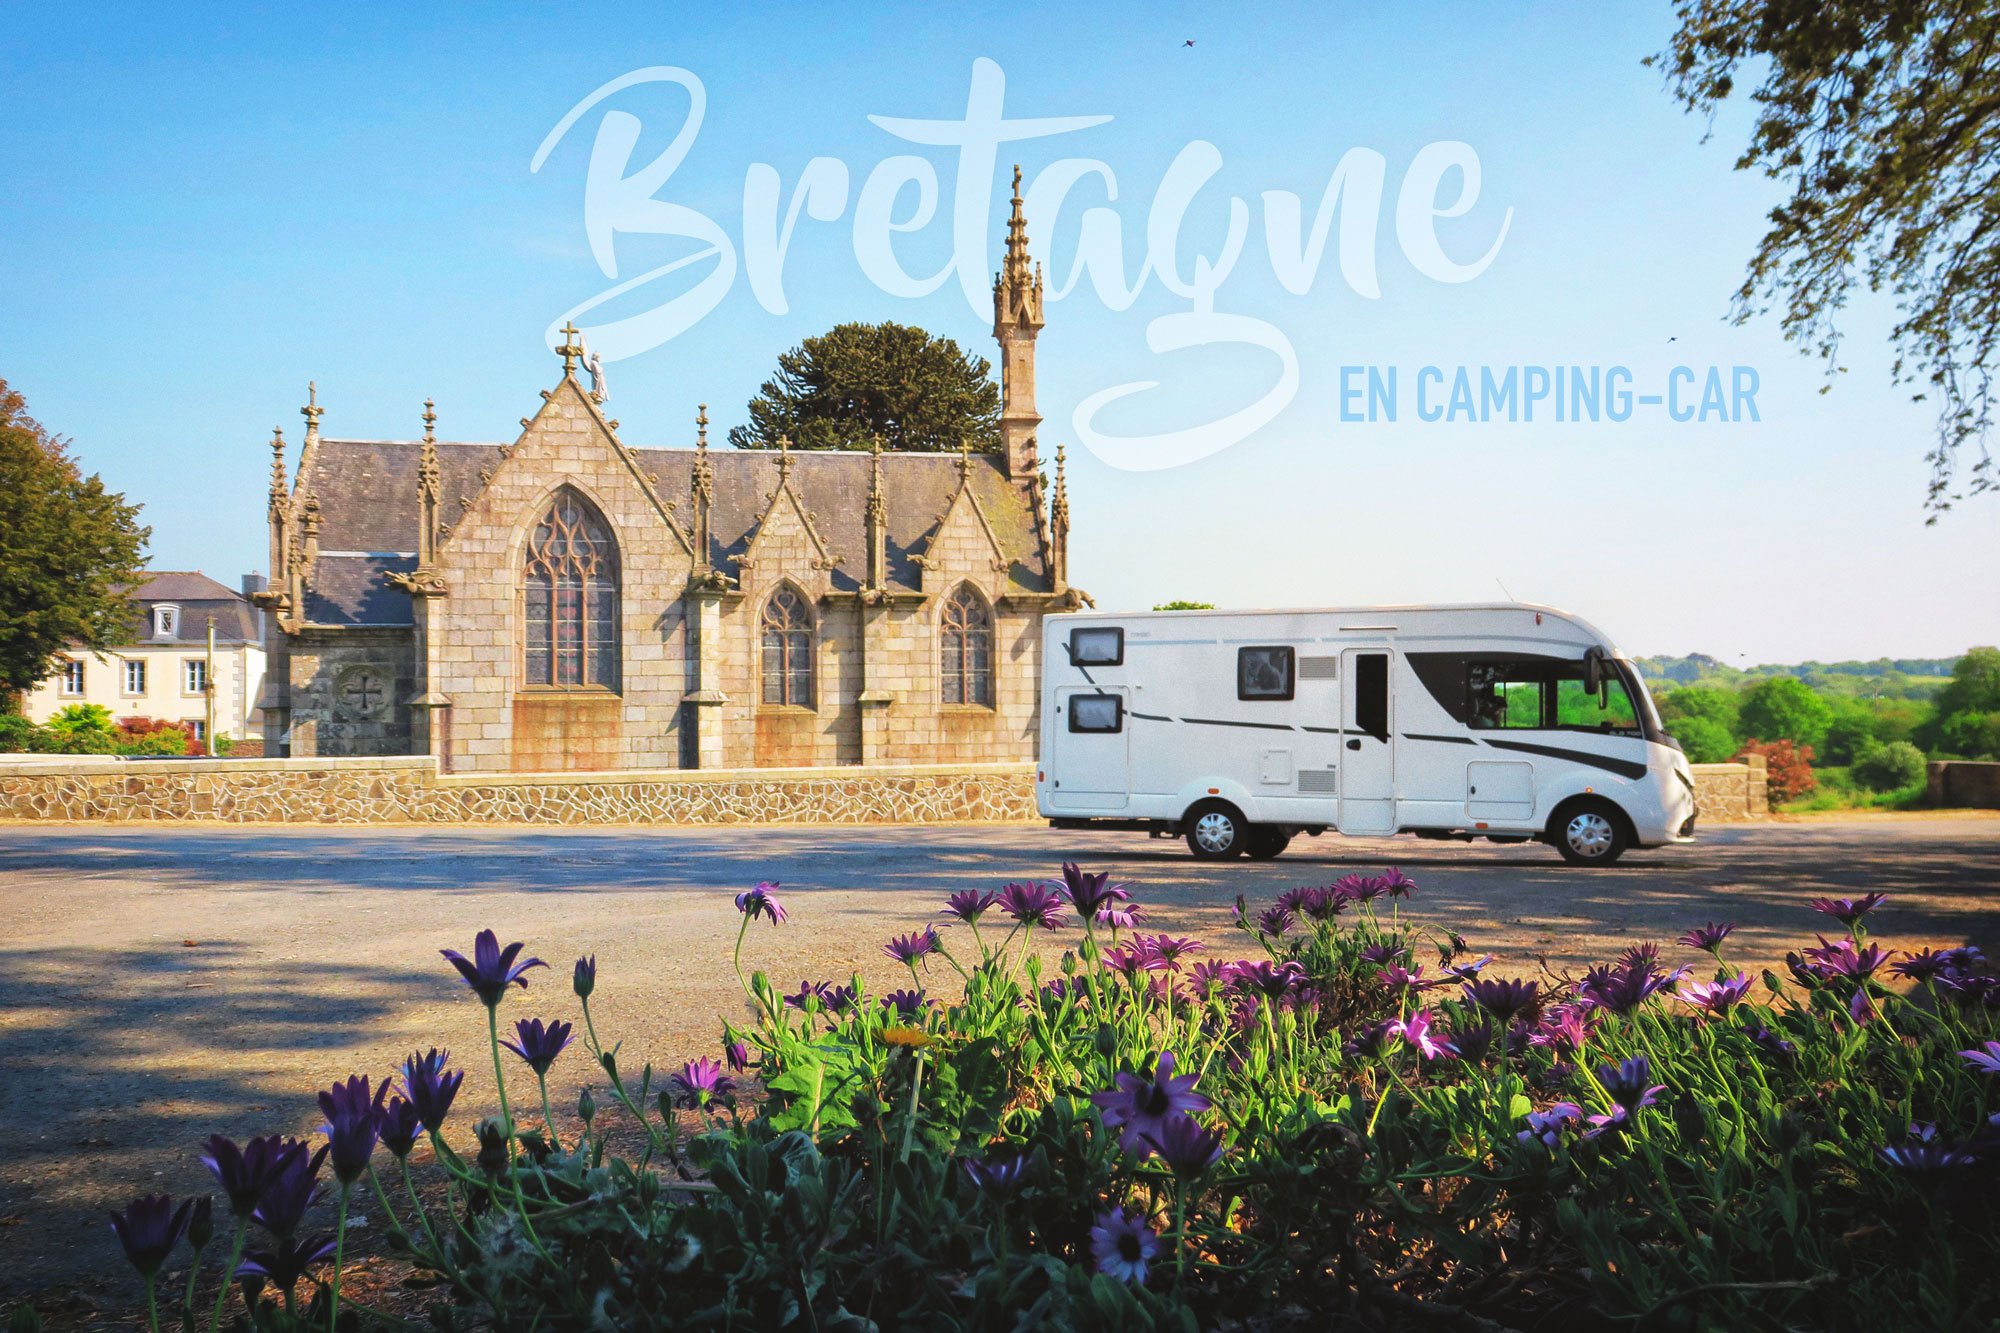 La Bretagne en Camping-Car